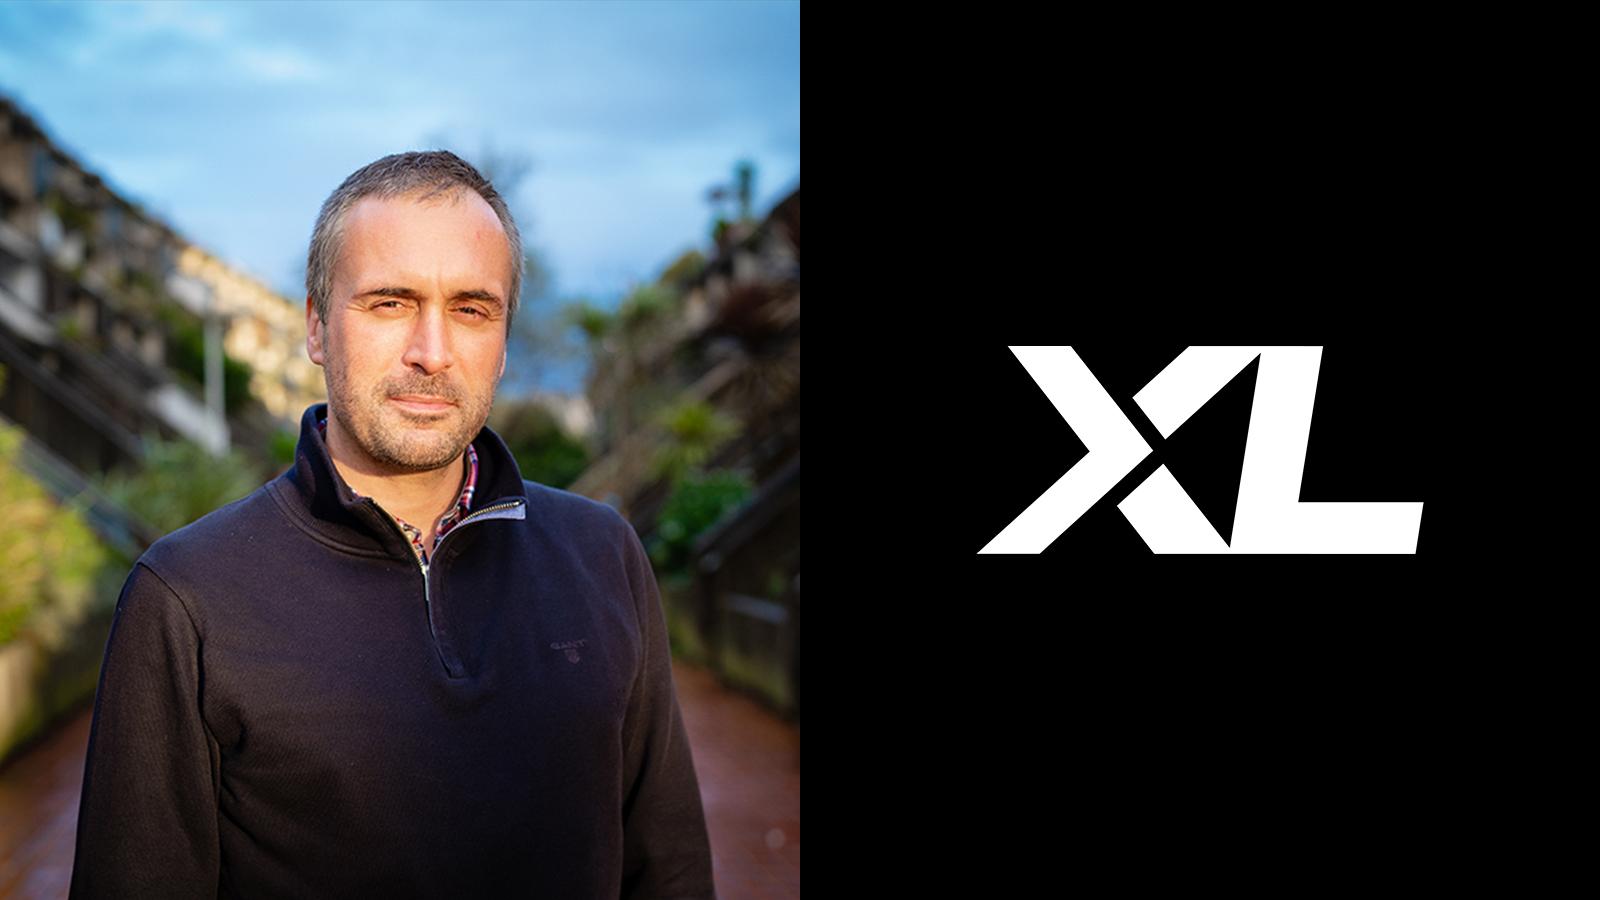 Wouter Sleijffers Excel Esports Rebrand